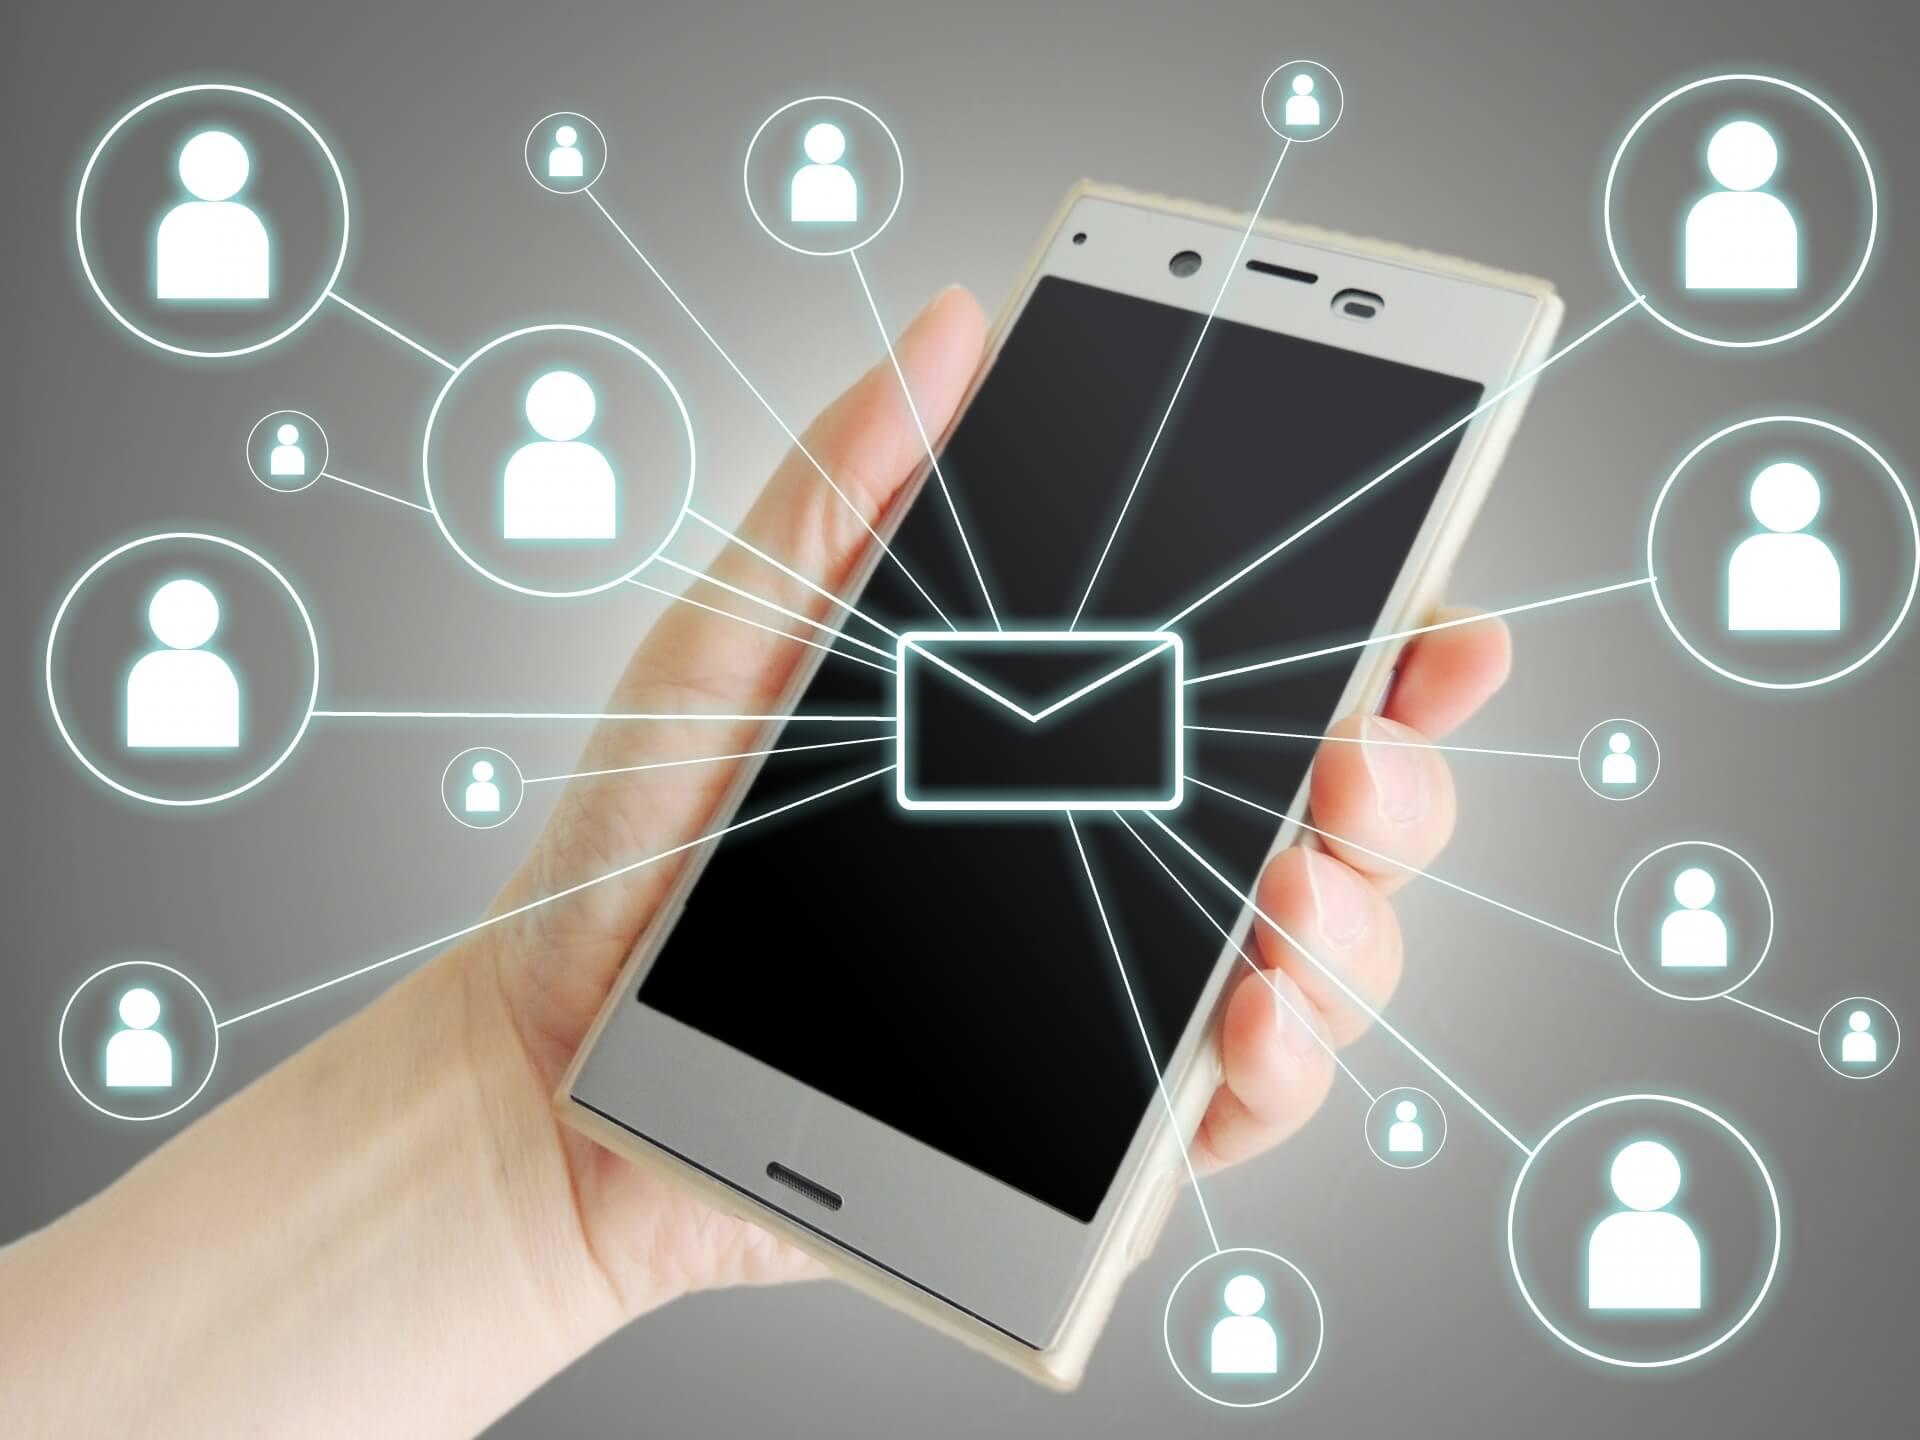 Web広告の合わせ技で派遣スタッフの登録促進を加速しよう